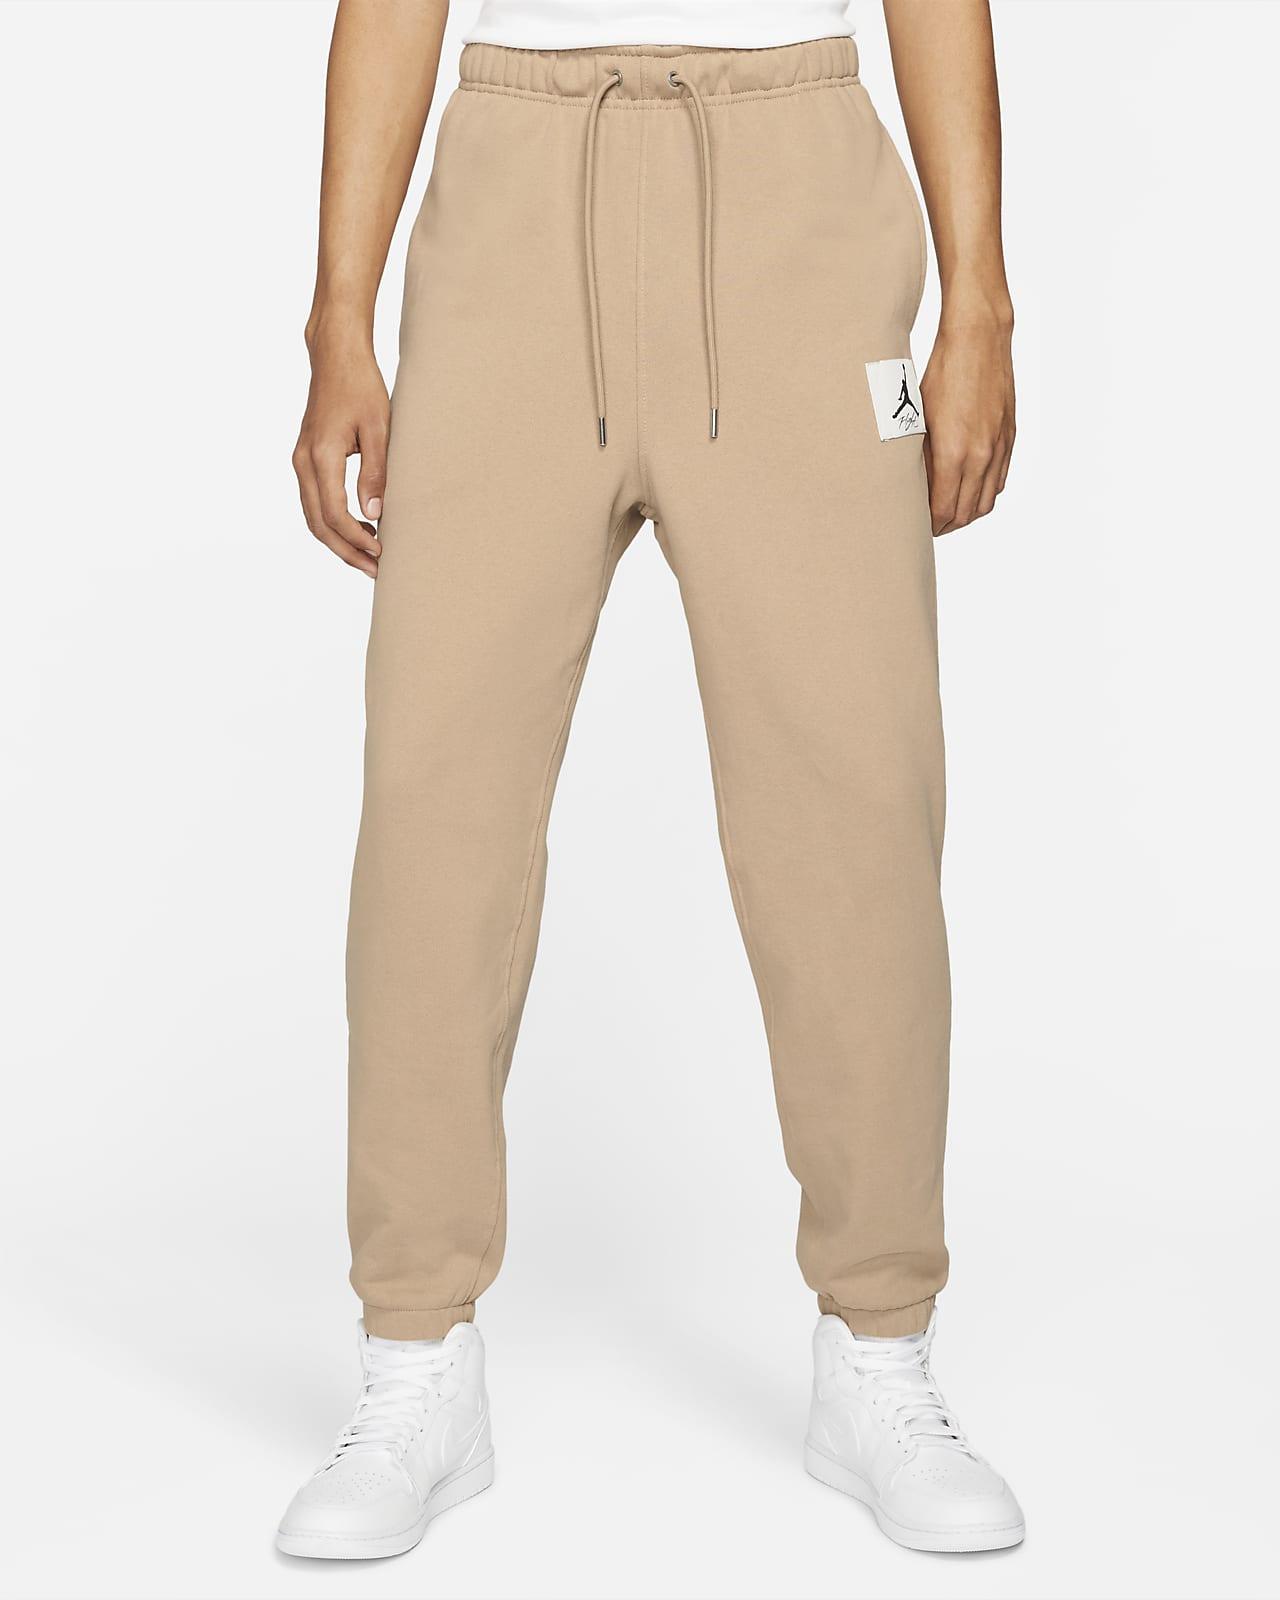 Pantaloni in fleece Statement Jordan Essentials - Uomo